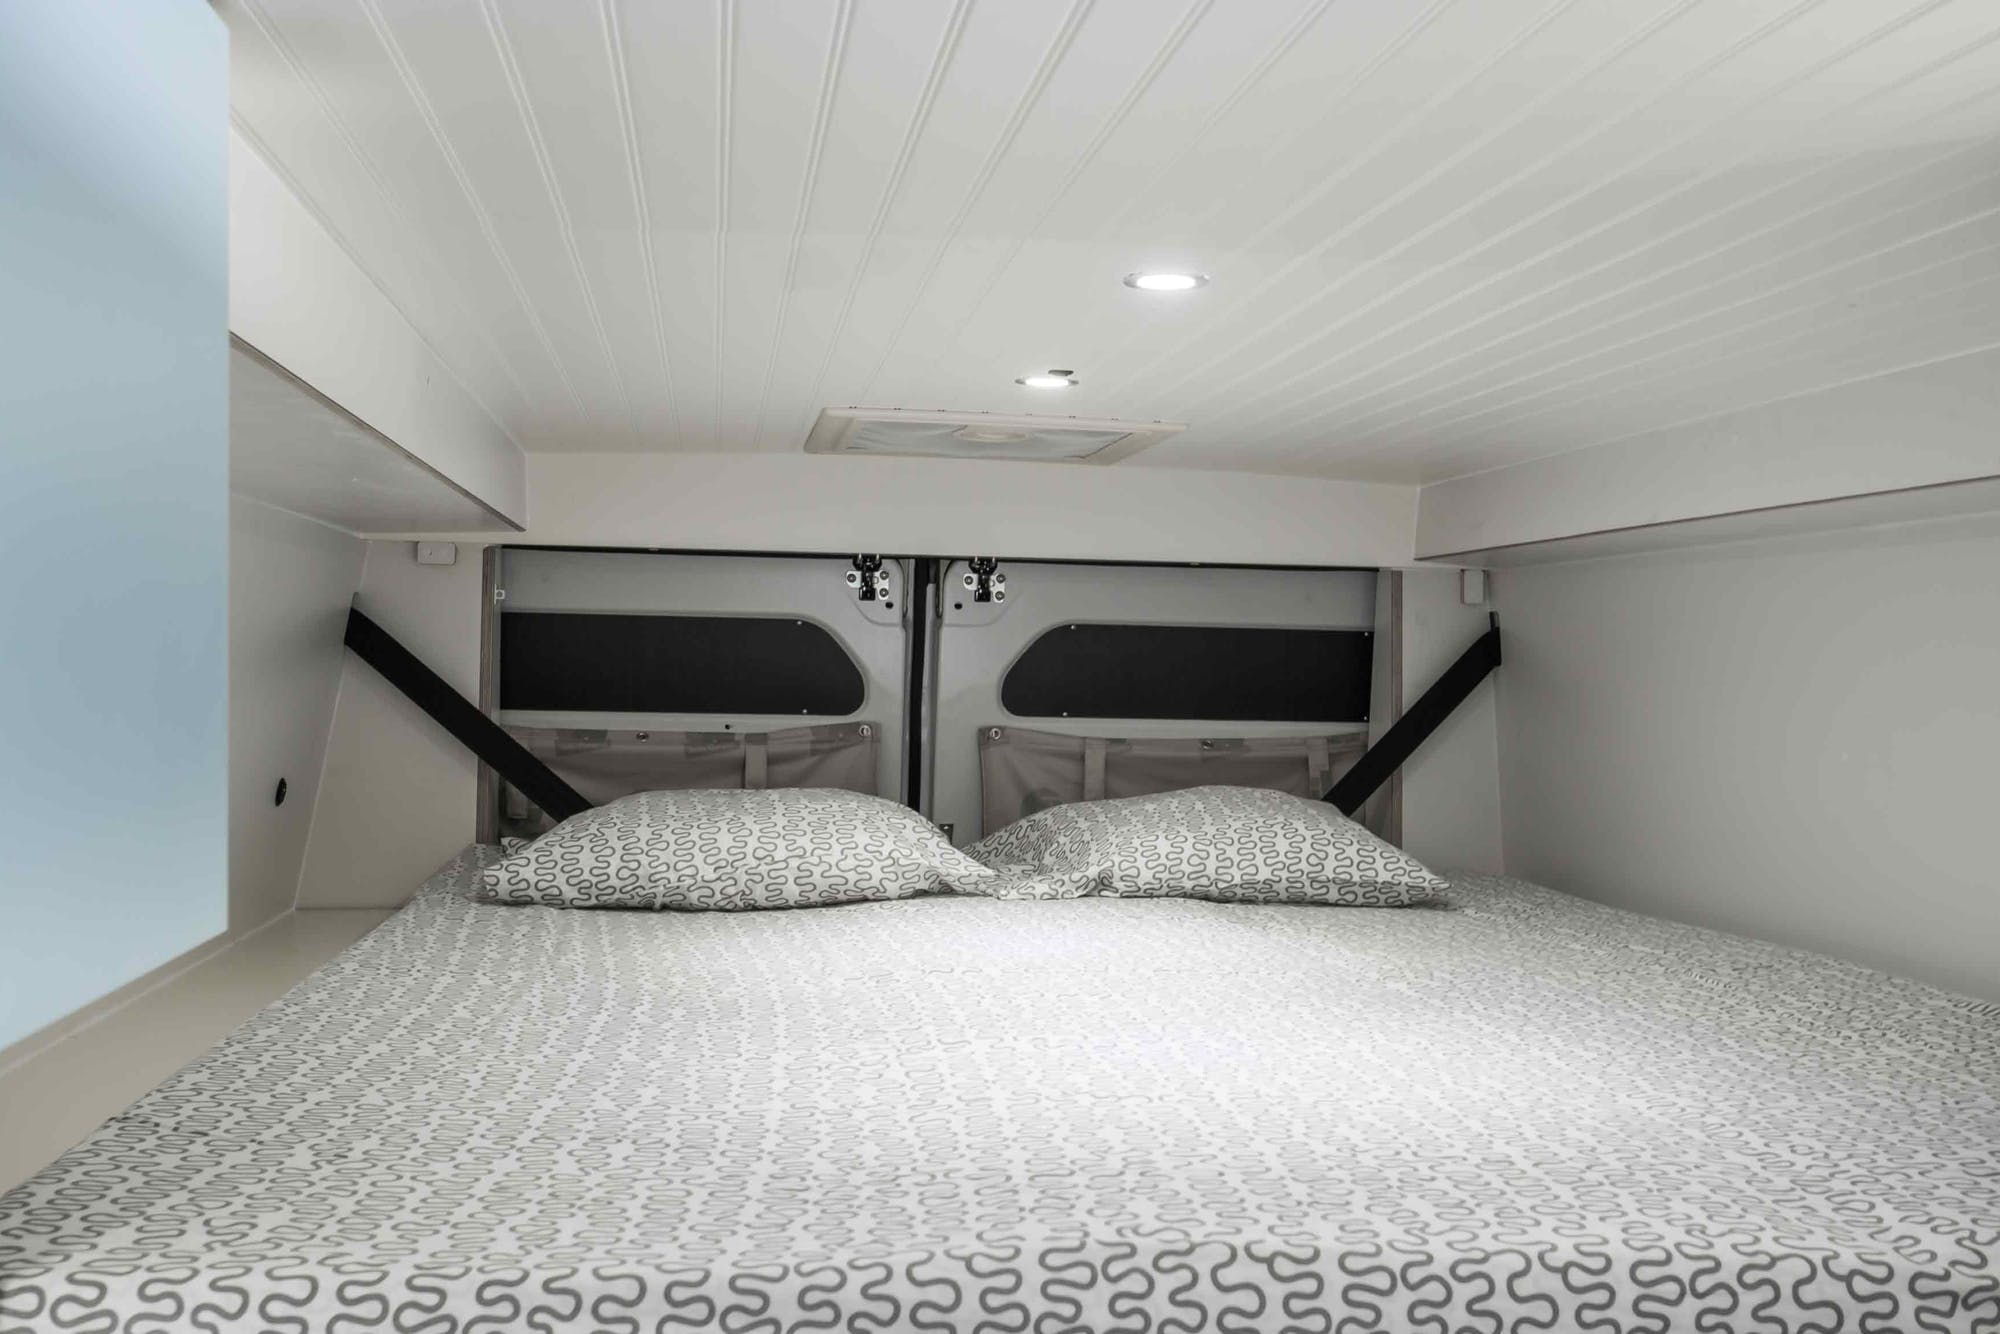 Motorhome Model's double bed